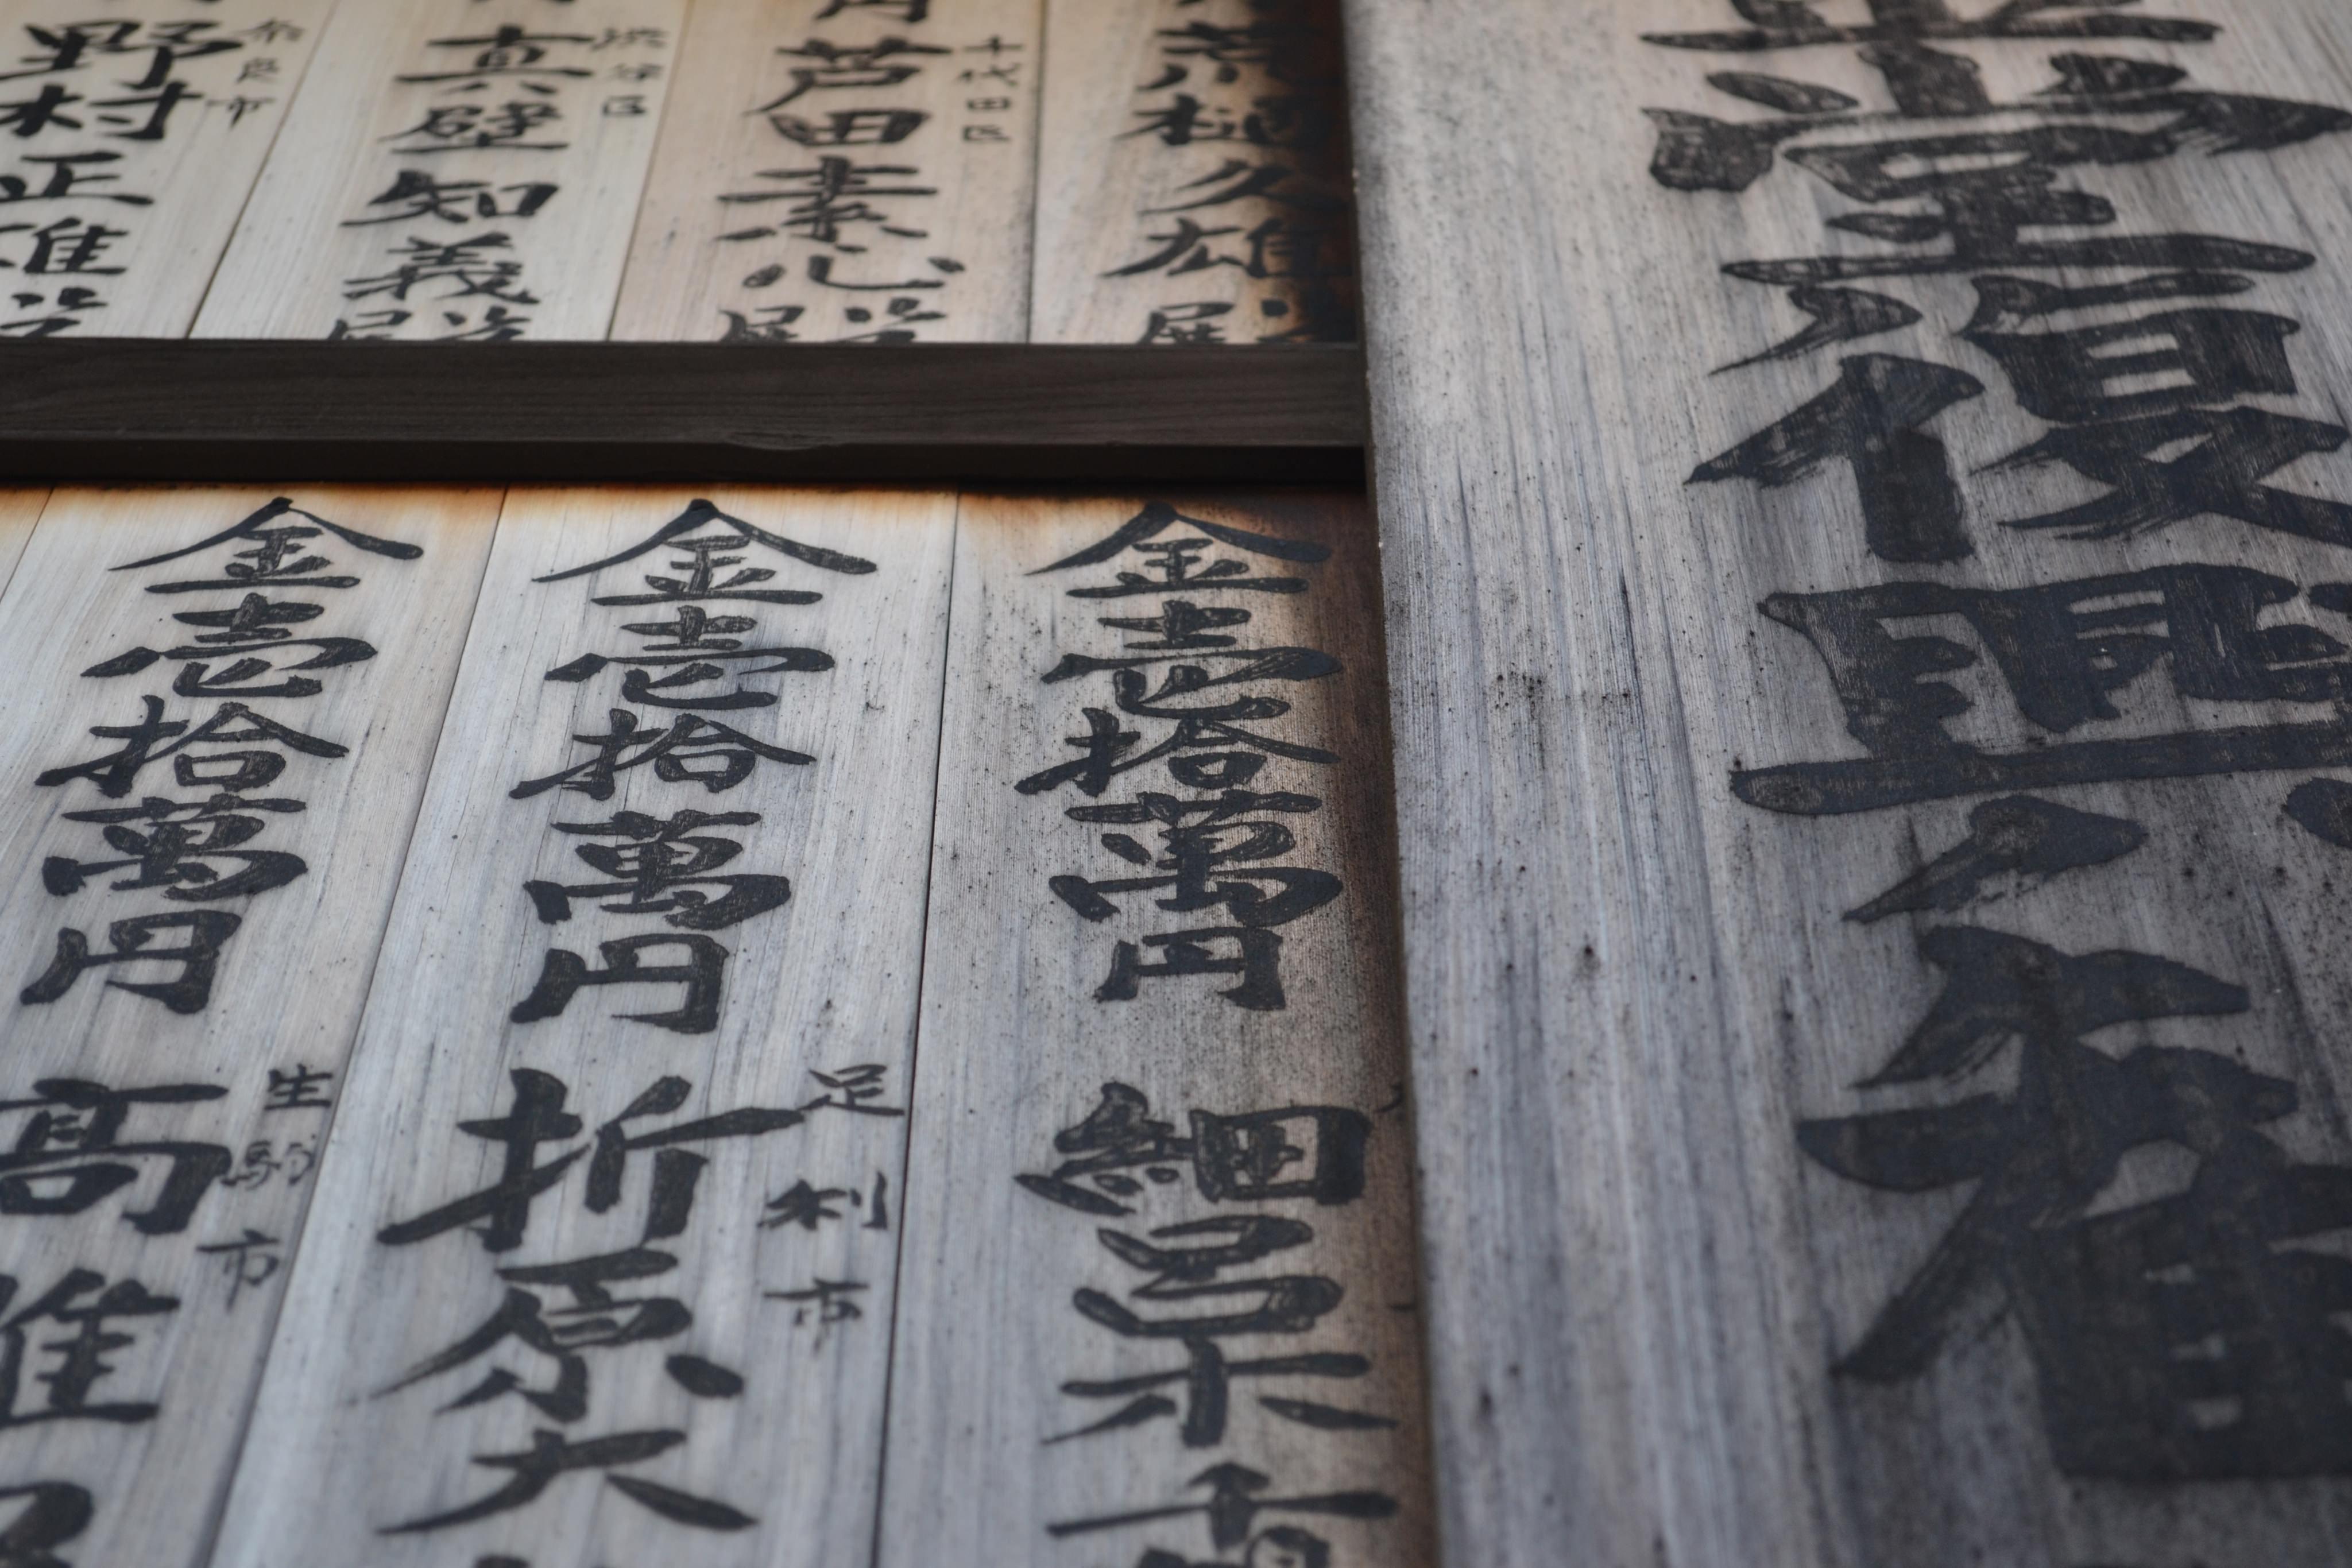 penulisan kayu jumlah tanda simbol mencetak komunikasi bisnis coretan tinta fon seni sketsa gambar teks tulisan